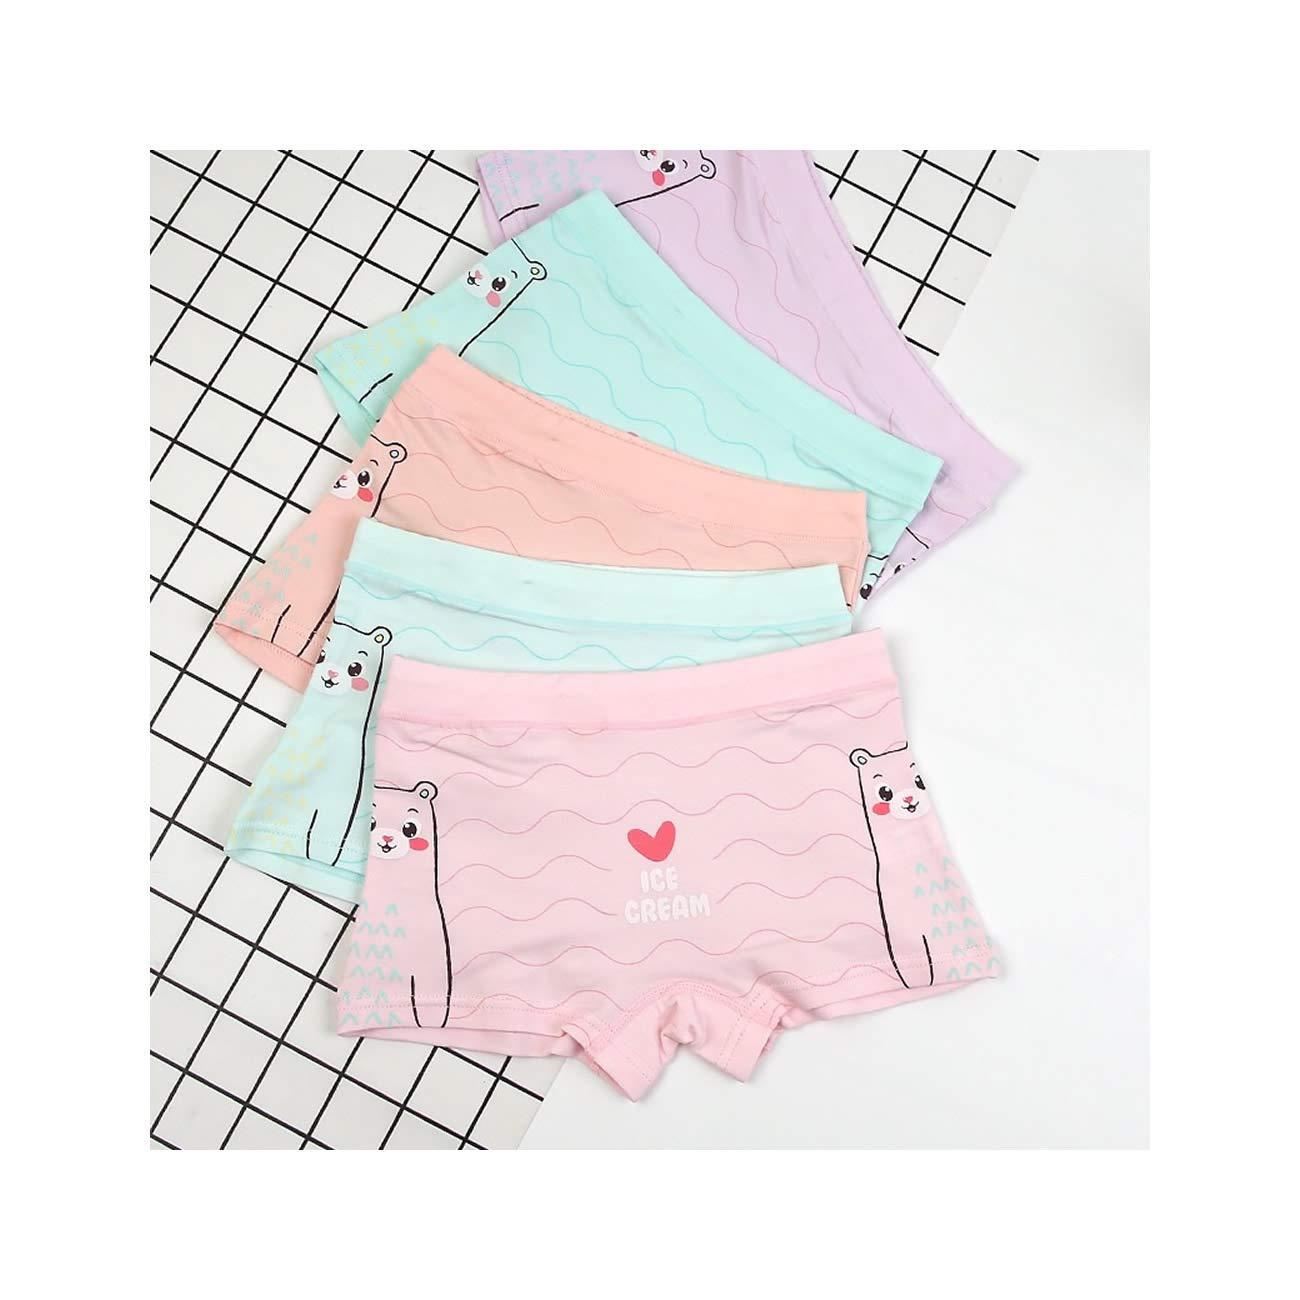 6fa59c771944 Get Quotations · Girls' Boyshort Toddler Briefs Premium Cotton Underwear  4pk Panties